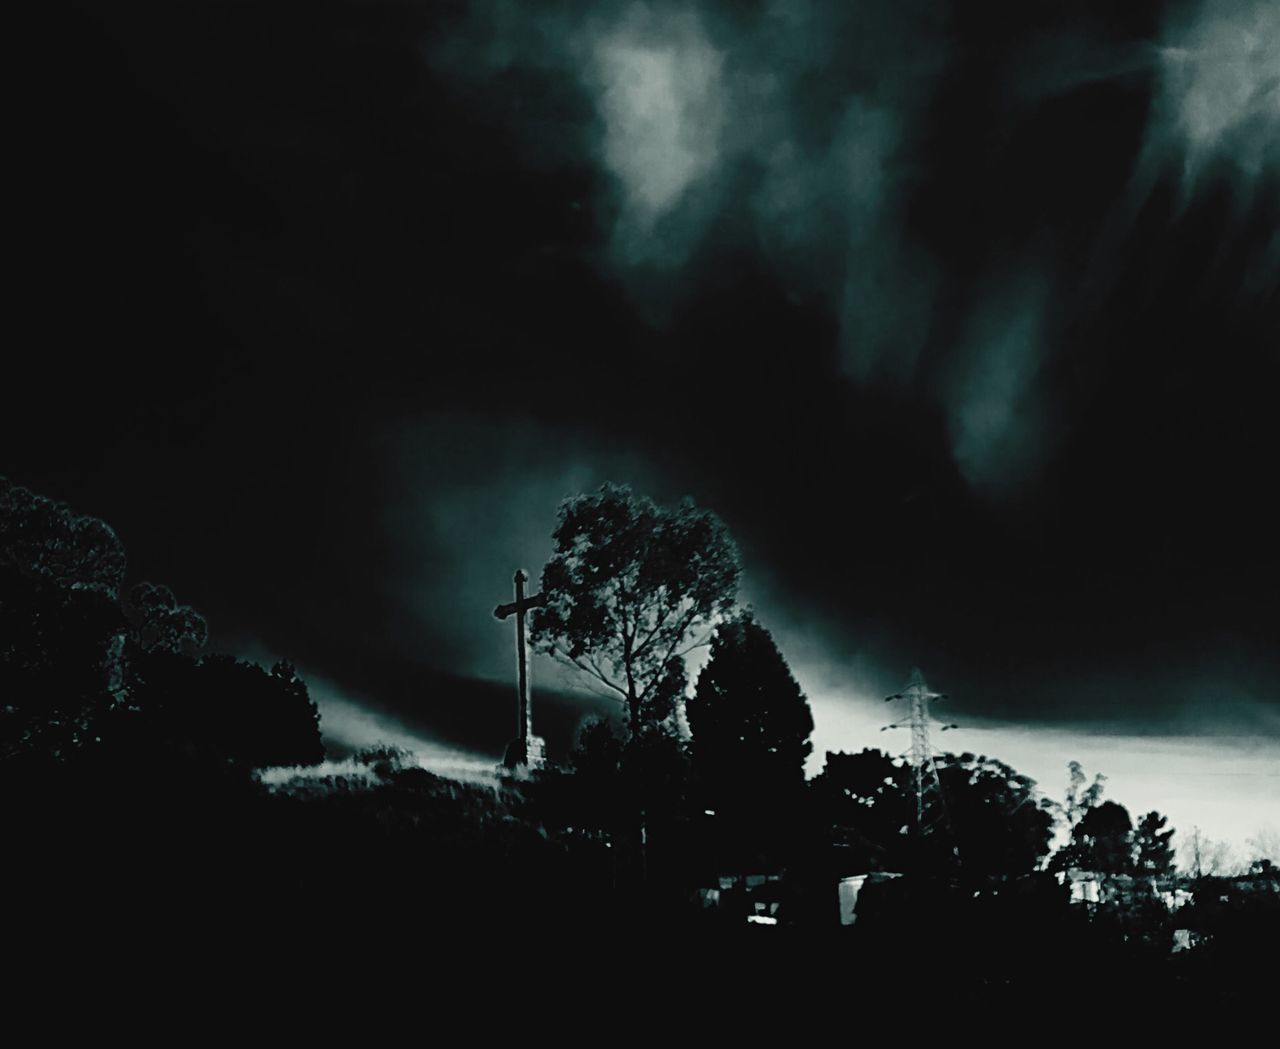 Night Noche Chile Tree Nature Dark Beauty In Nature Tranquility Low Angle View Chile♥ Chilegram Arte Foto Concepcion, CHile Lota EyeEmNewHere First Eyeem Photo Lota Octaba Region. EyeEm Best Shots Illuminated Paisaje Paris, France  The Great Outdoors - 2017 EyeEm Awards Visual Feast Bestoftheday